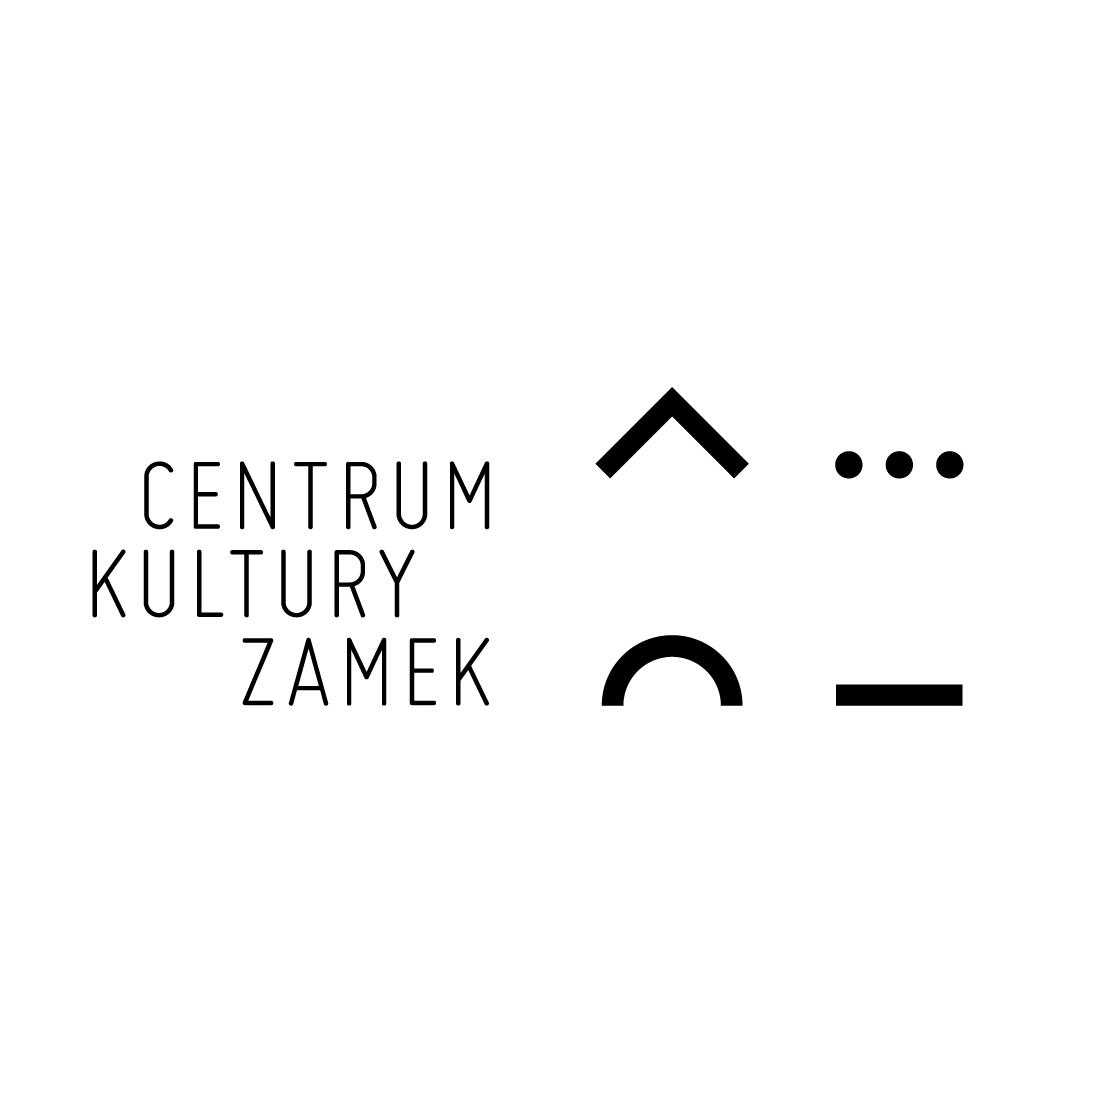 centr_kult_zamek